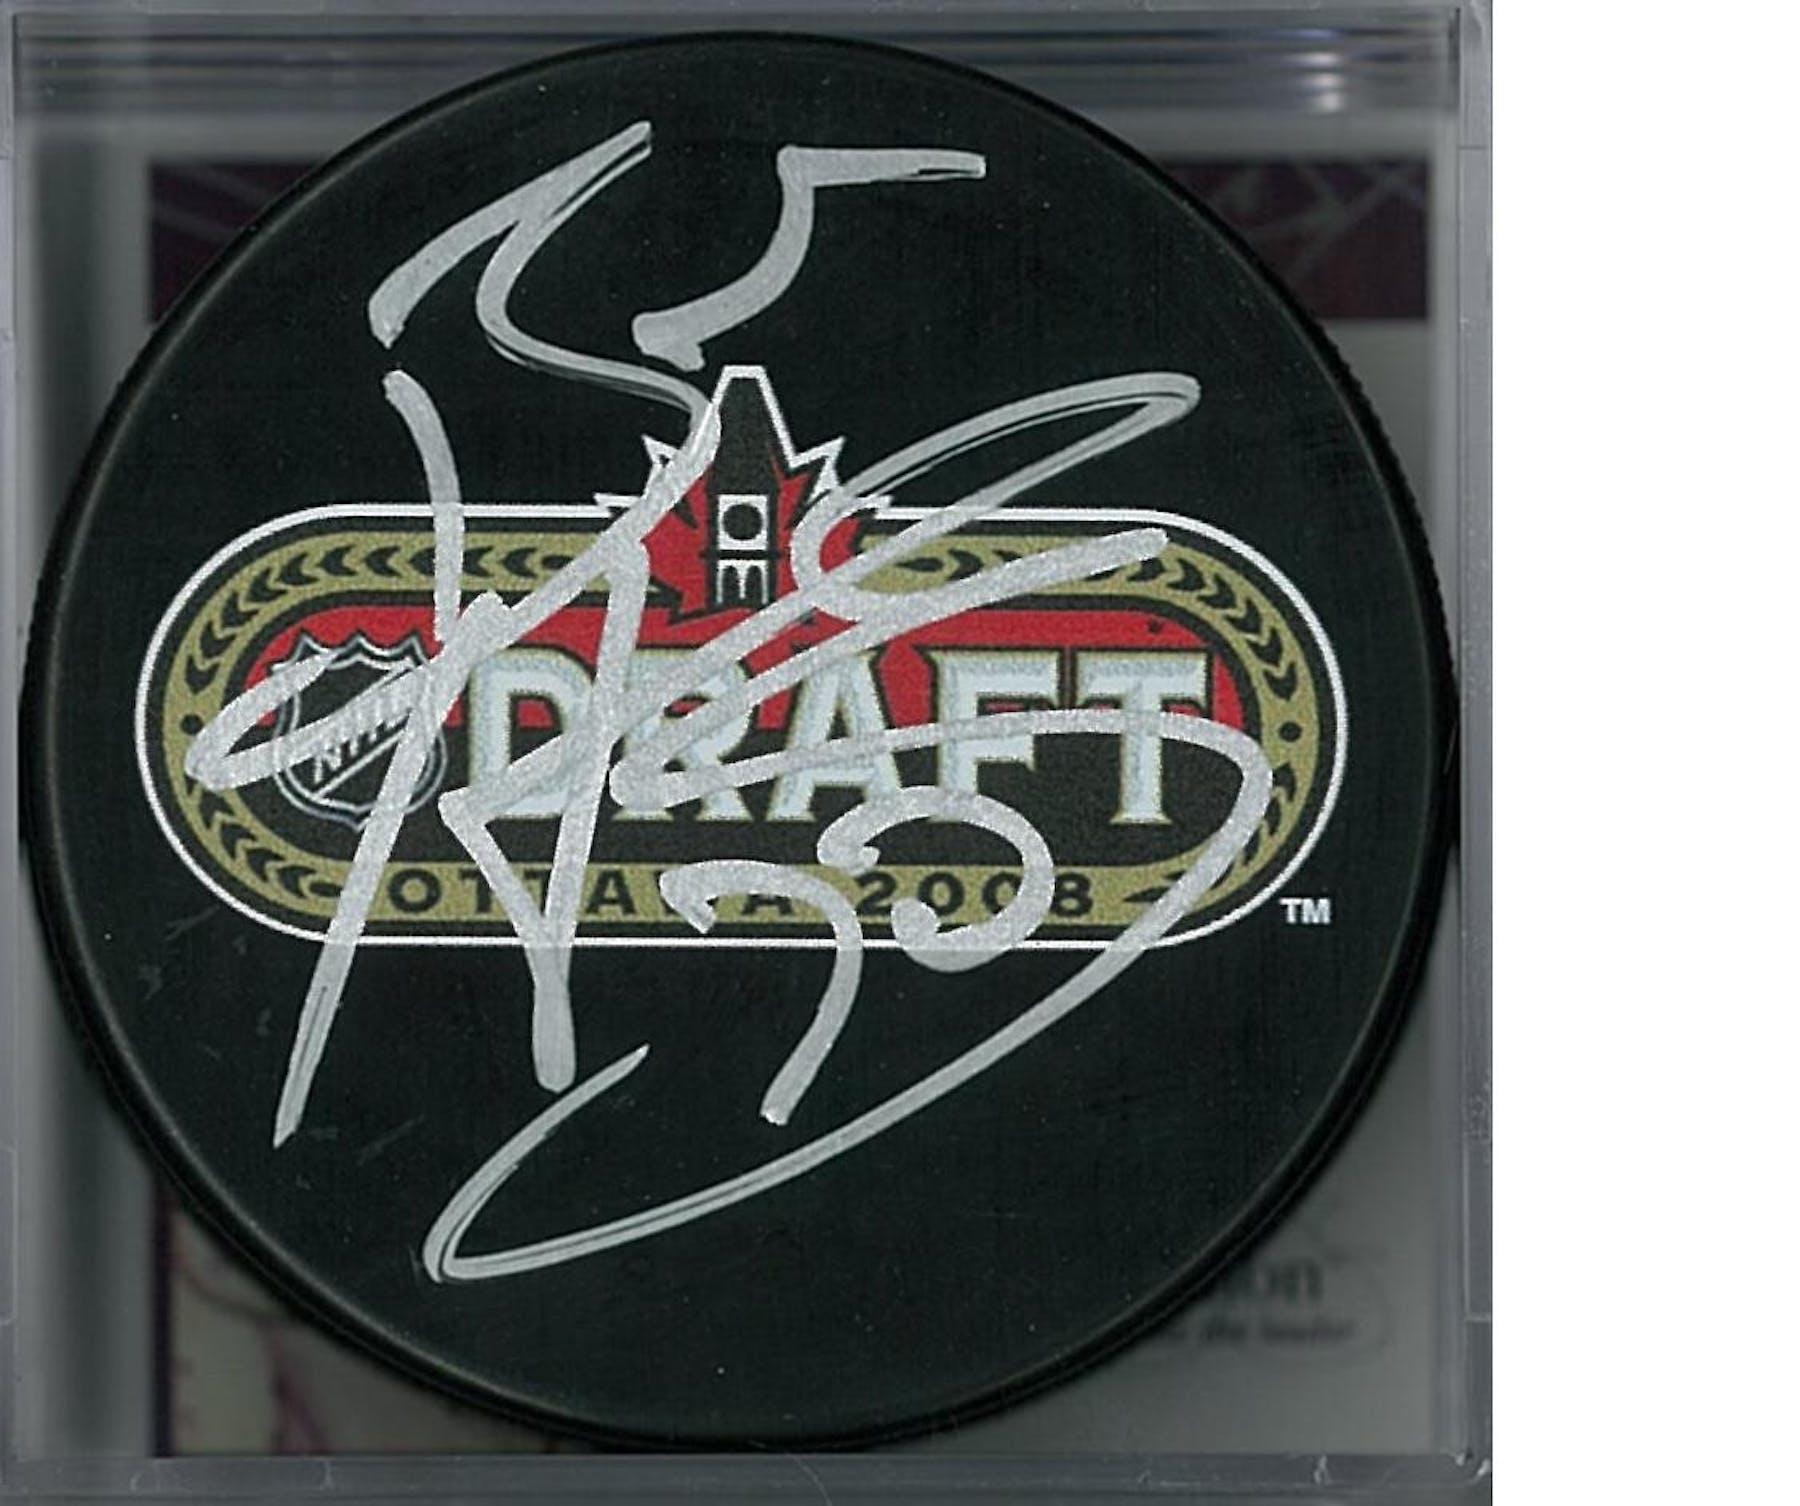 newest 7cc70 f5469 Braden Holtby Autographed 2008 NHL Draft Hockey Puck (JSA COA)